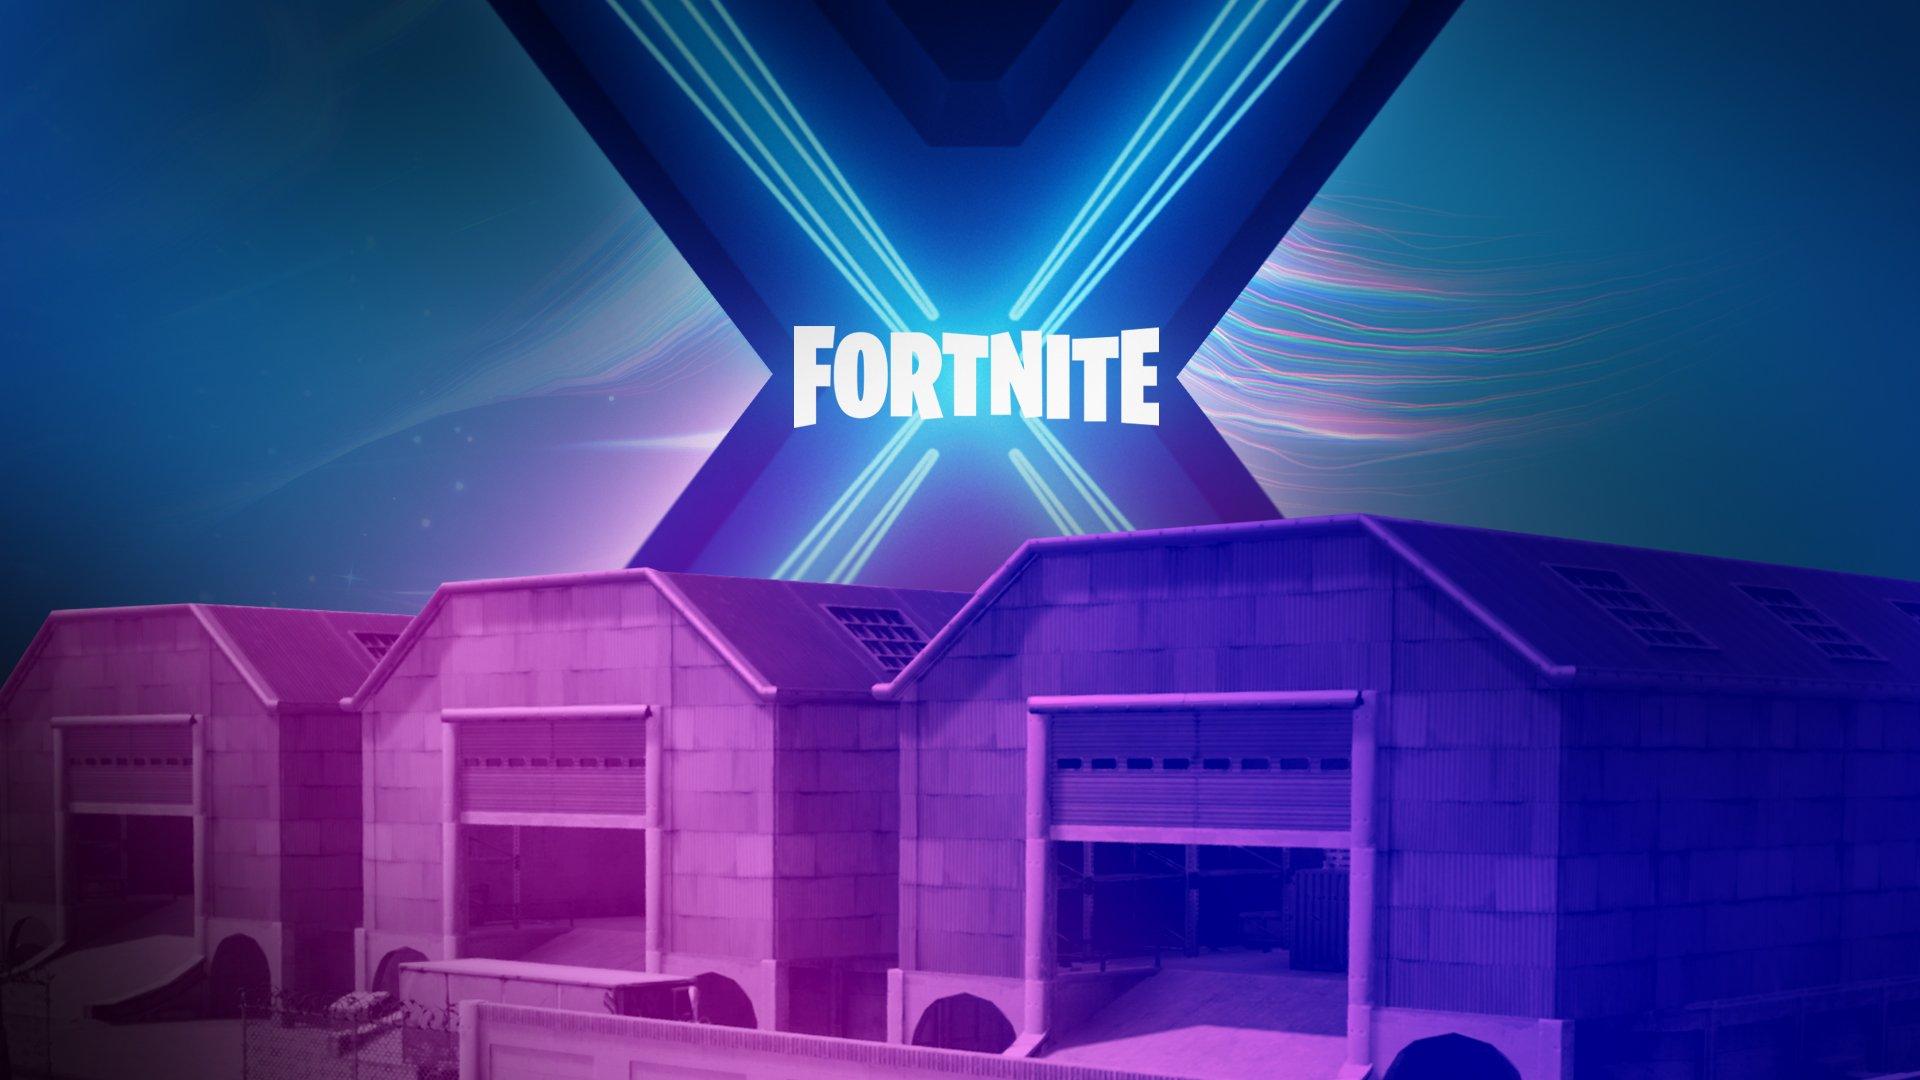 Fortnite Season 10 Teaser 4 Shows Loot Lake Orb Event